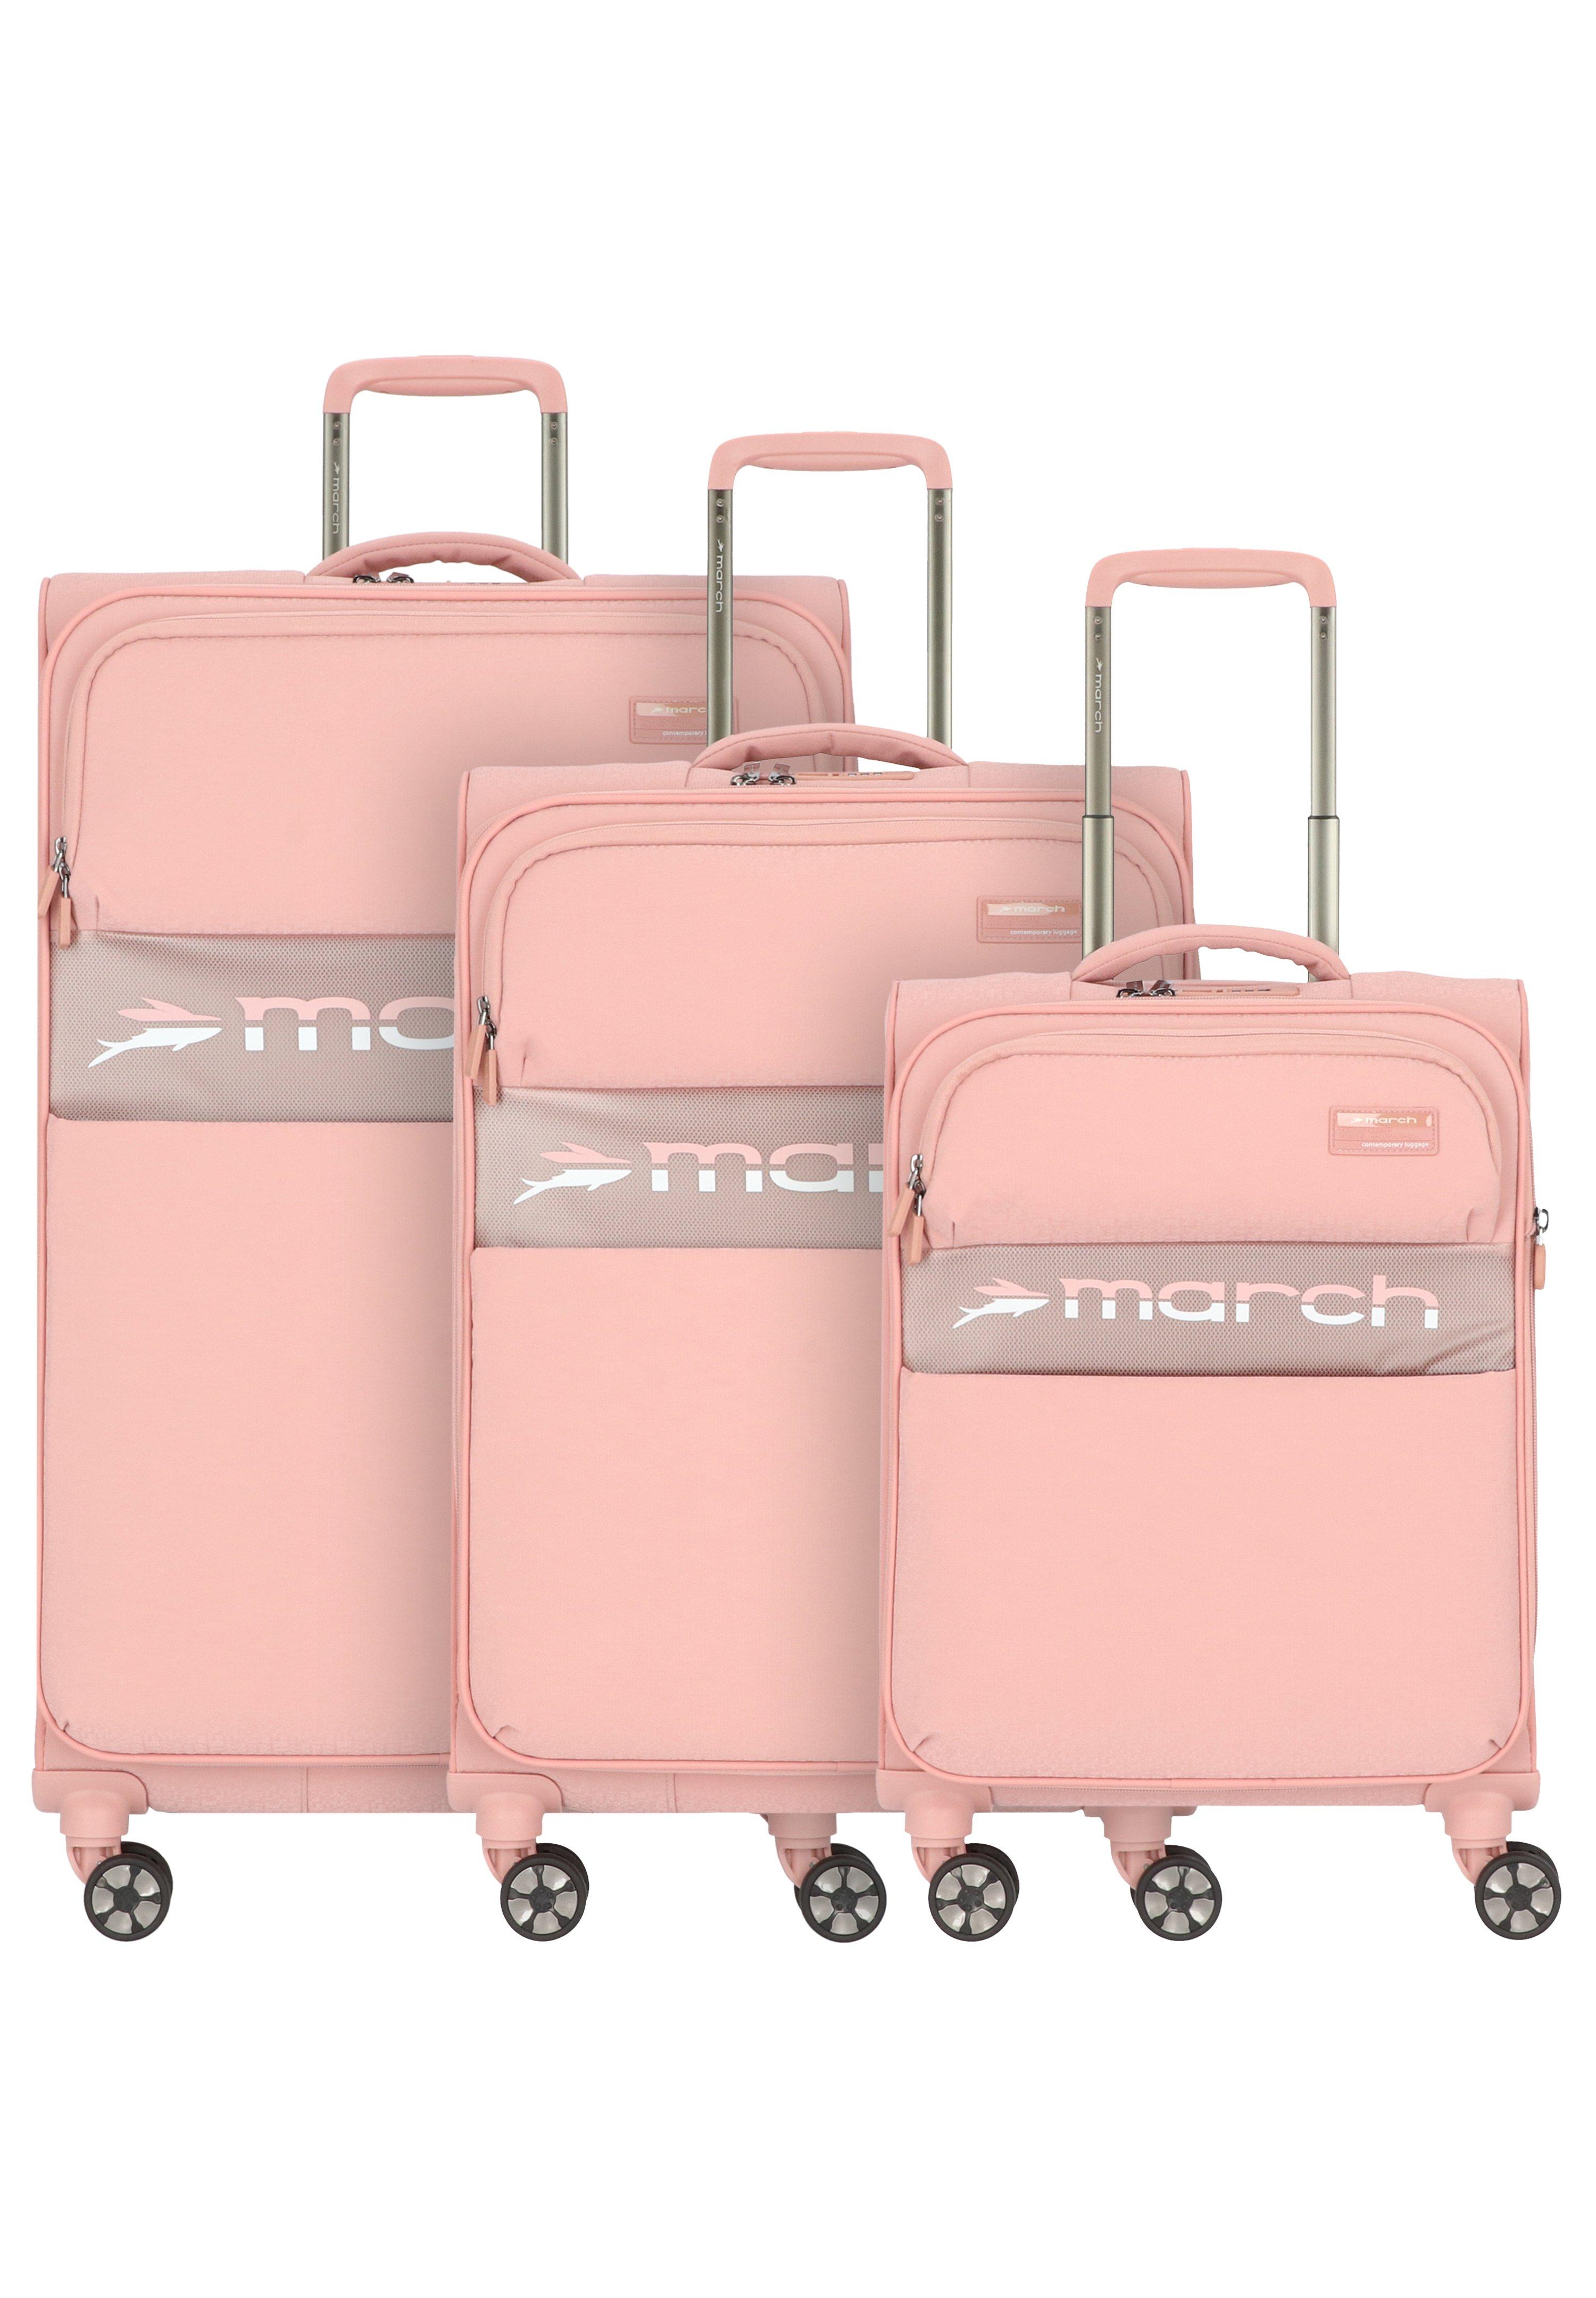 Uomo SET - Set di valigie